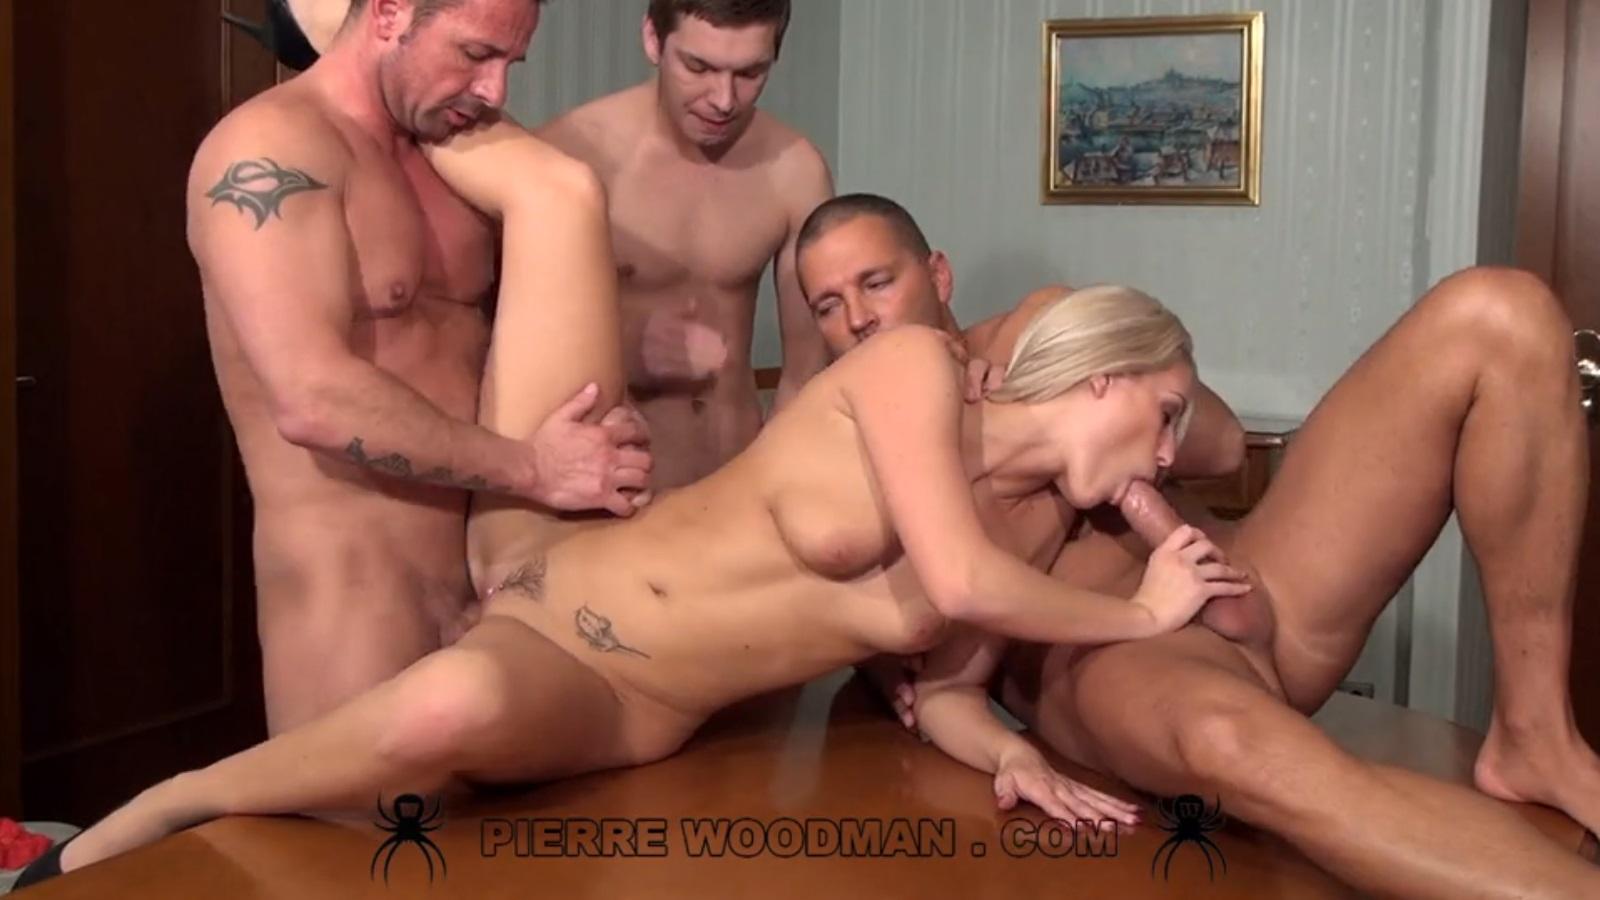 Woodman gangbang